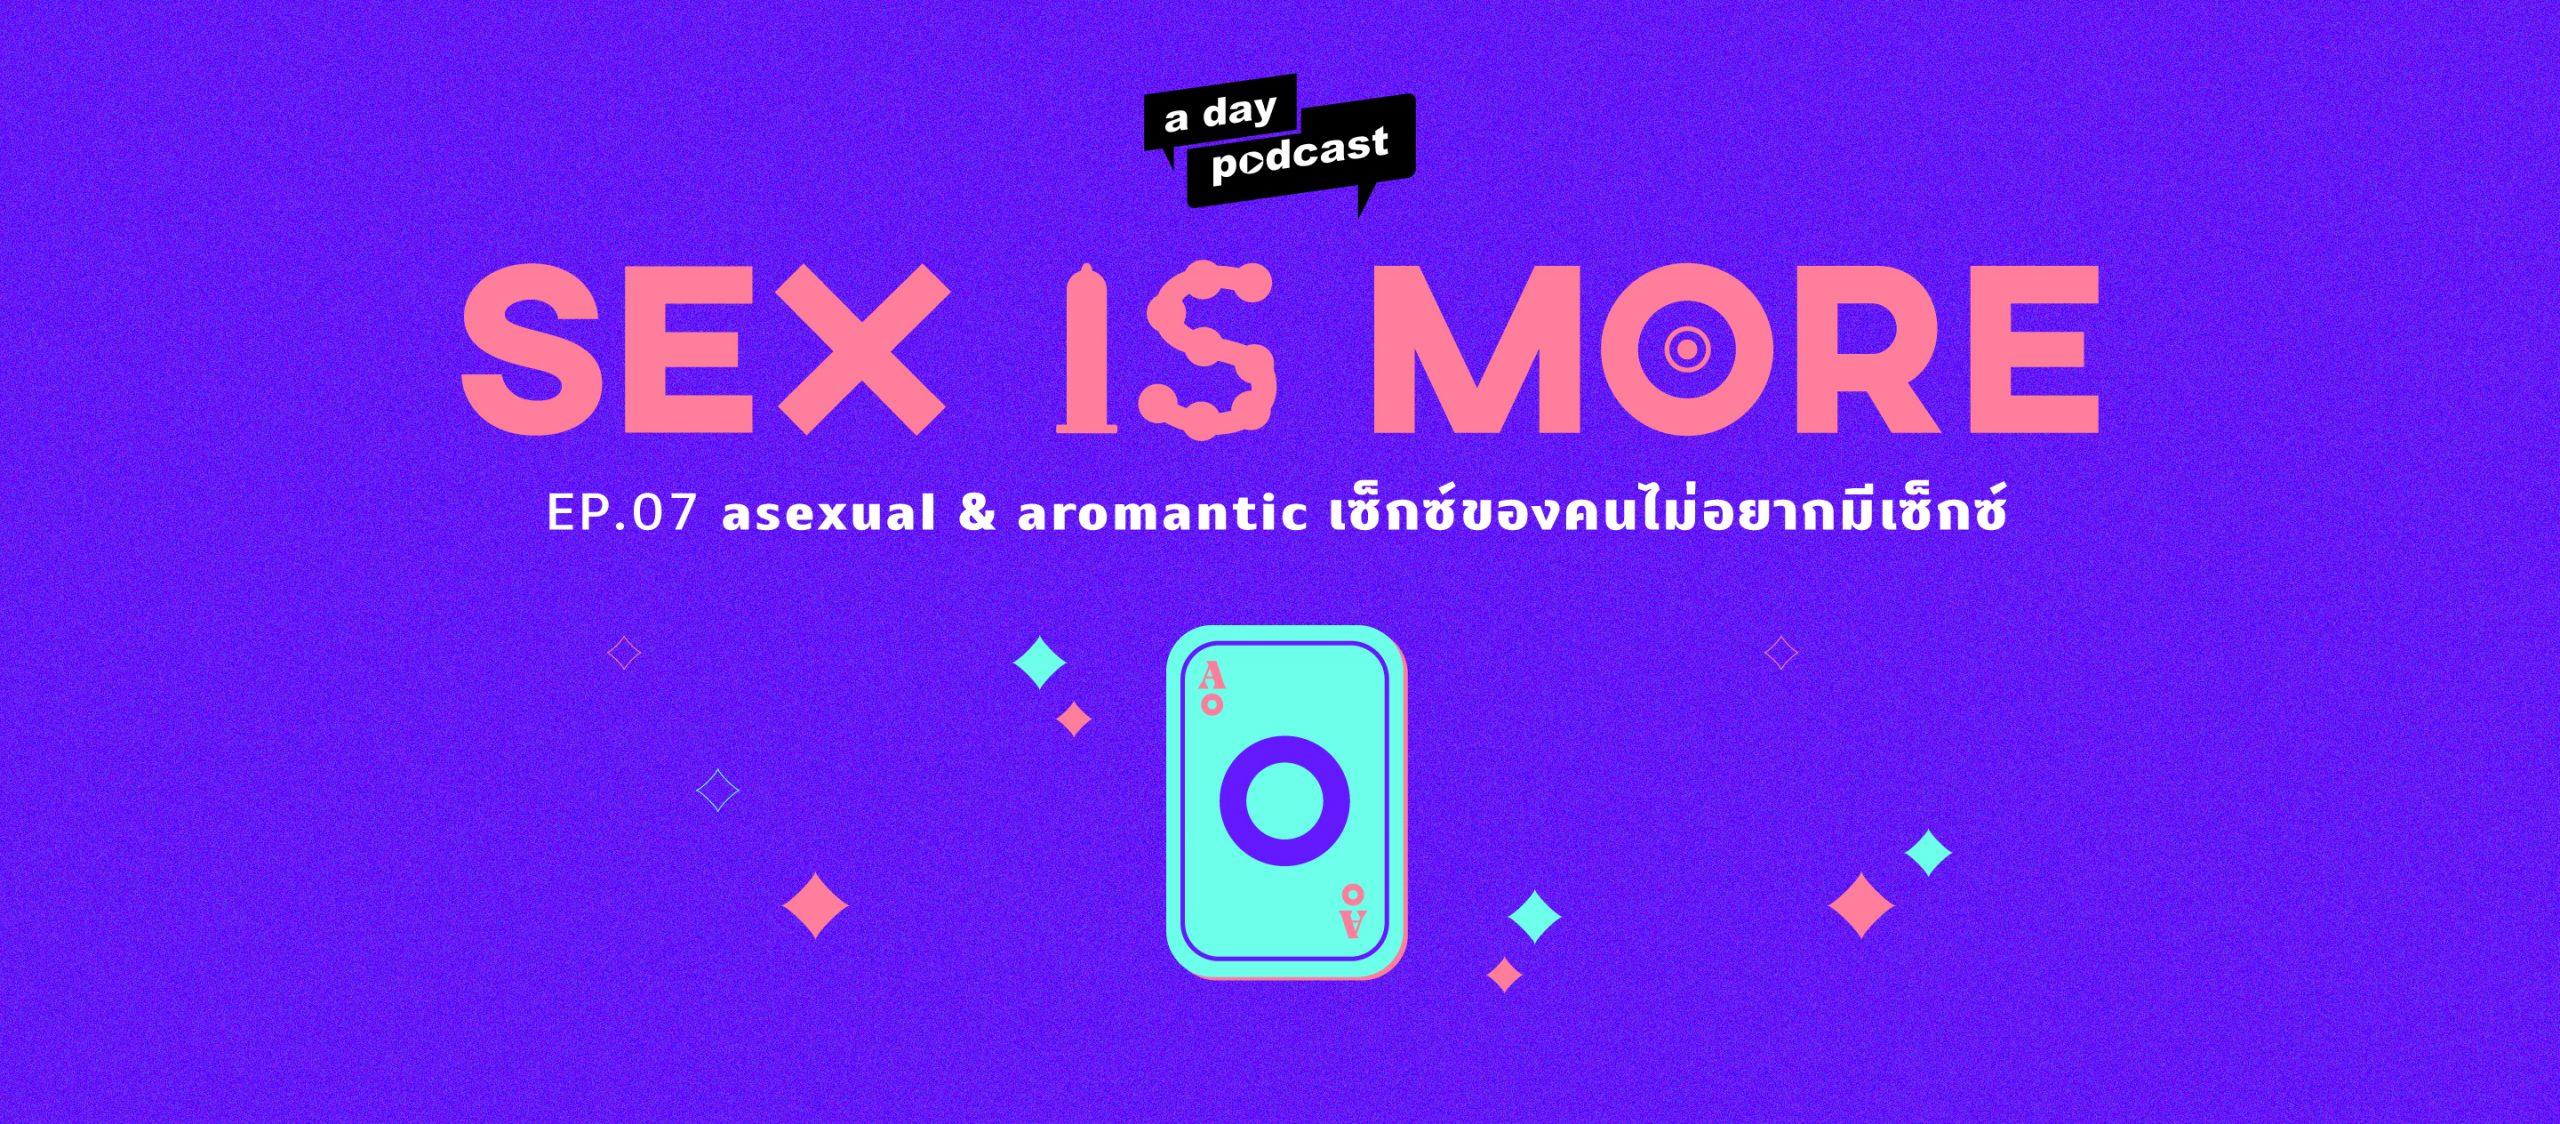 Sex is More EP.07 asexual & aromantic เซ็กซ์ของคนไม่อยากมีเซ็กซ์